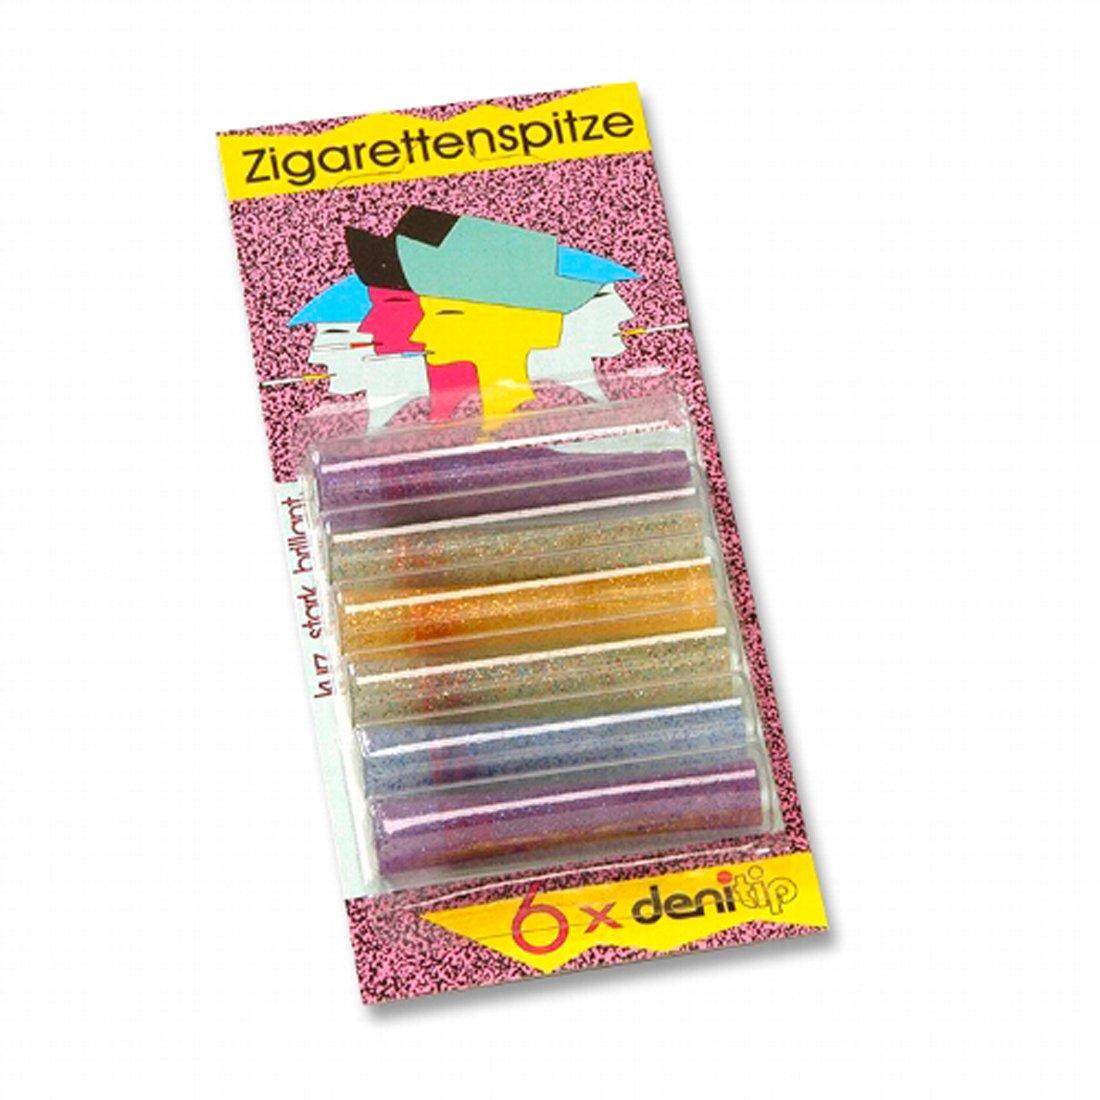 Zigarettenspitze DENICOTEA Denitip Glamour 6 Stück, Preis Stück € 0,33